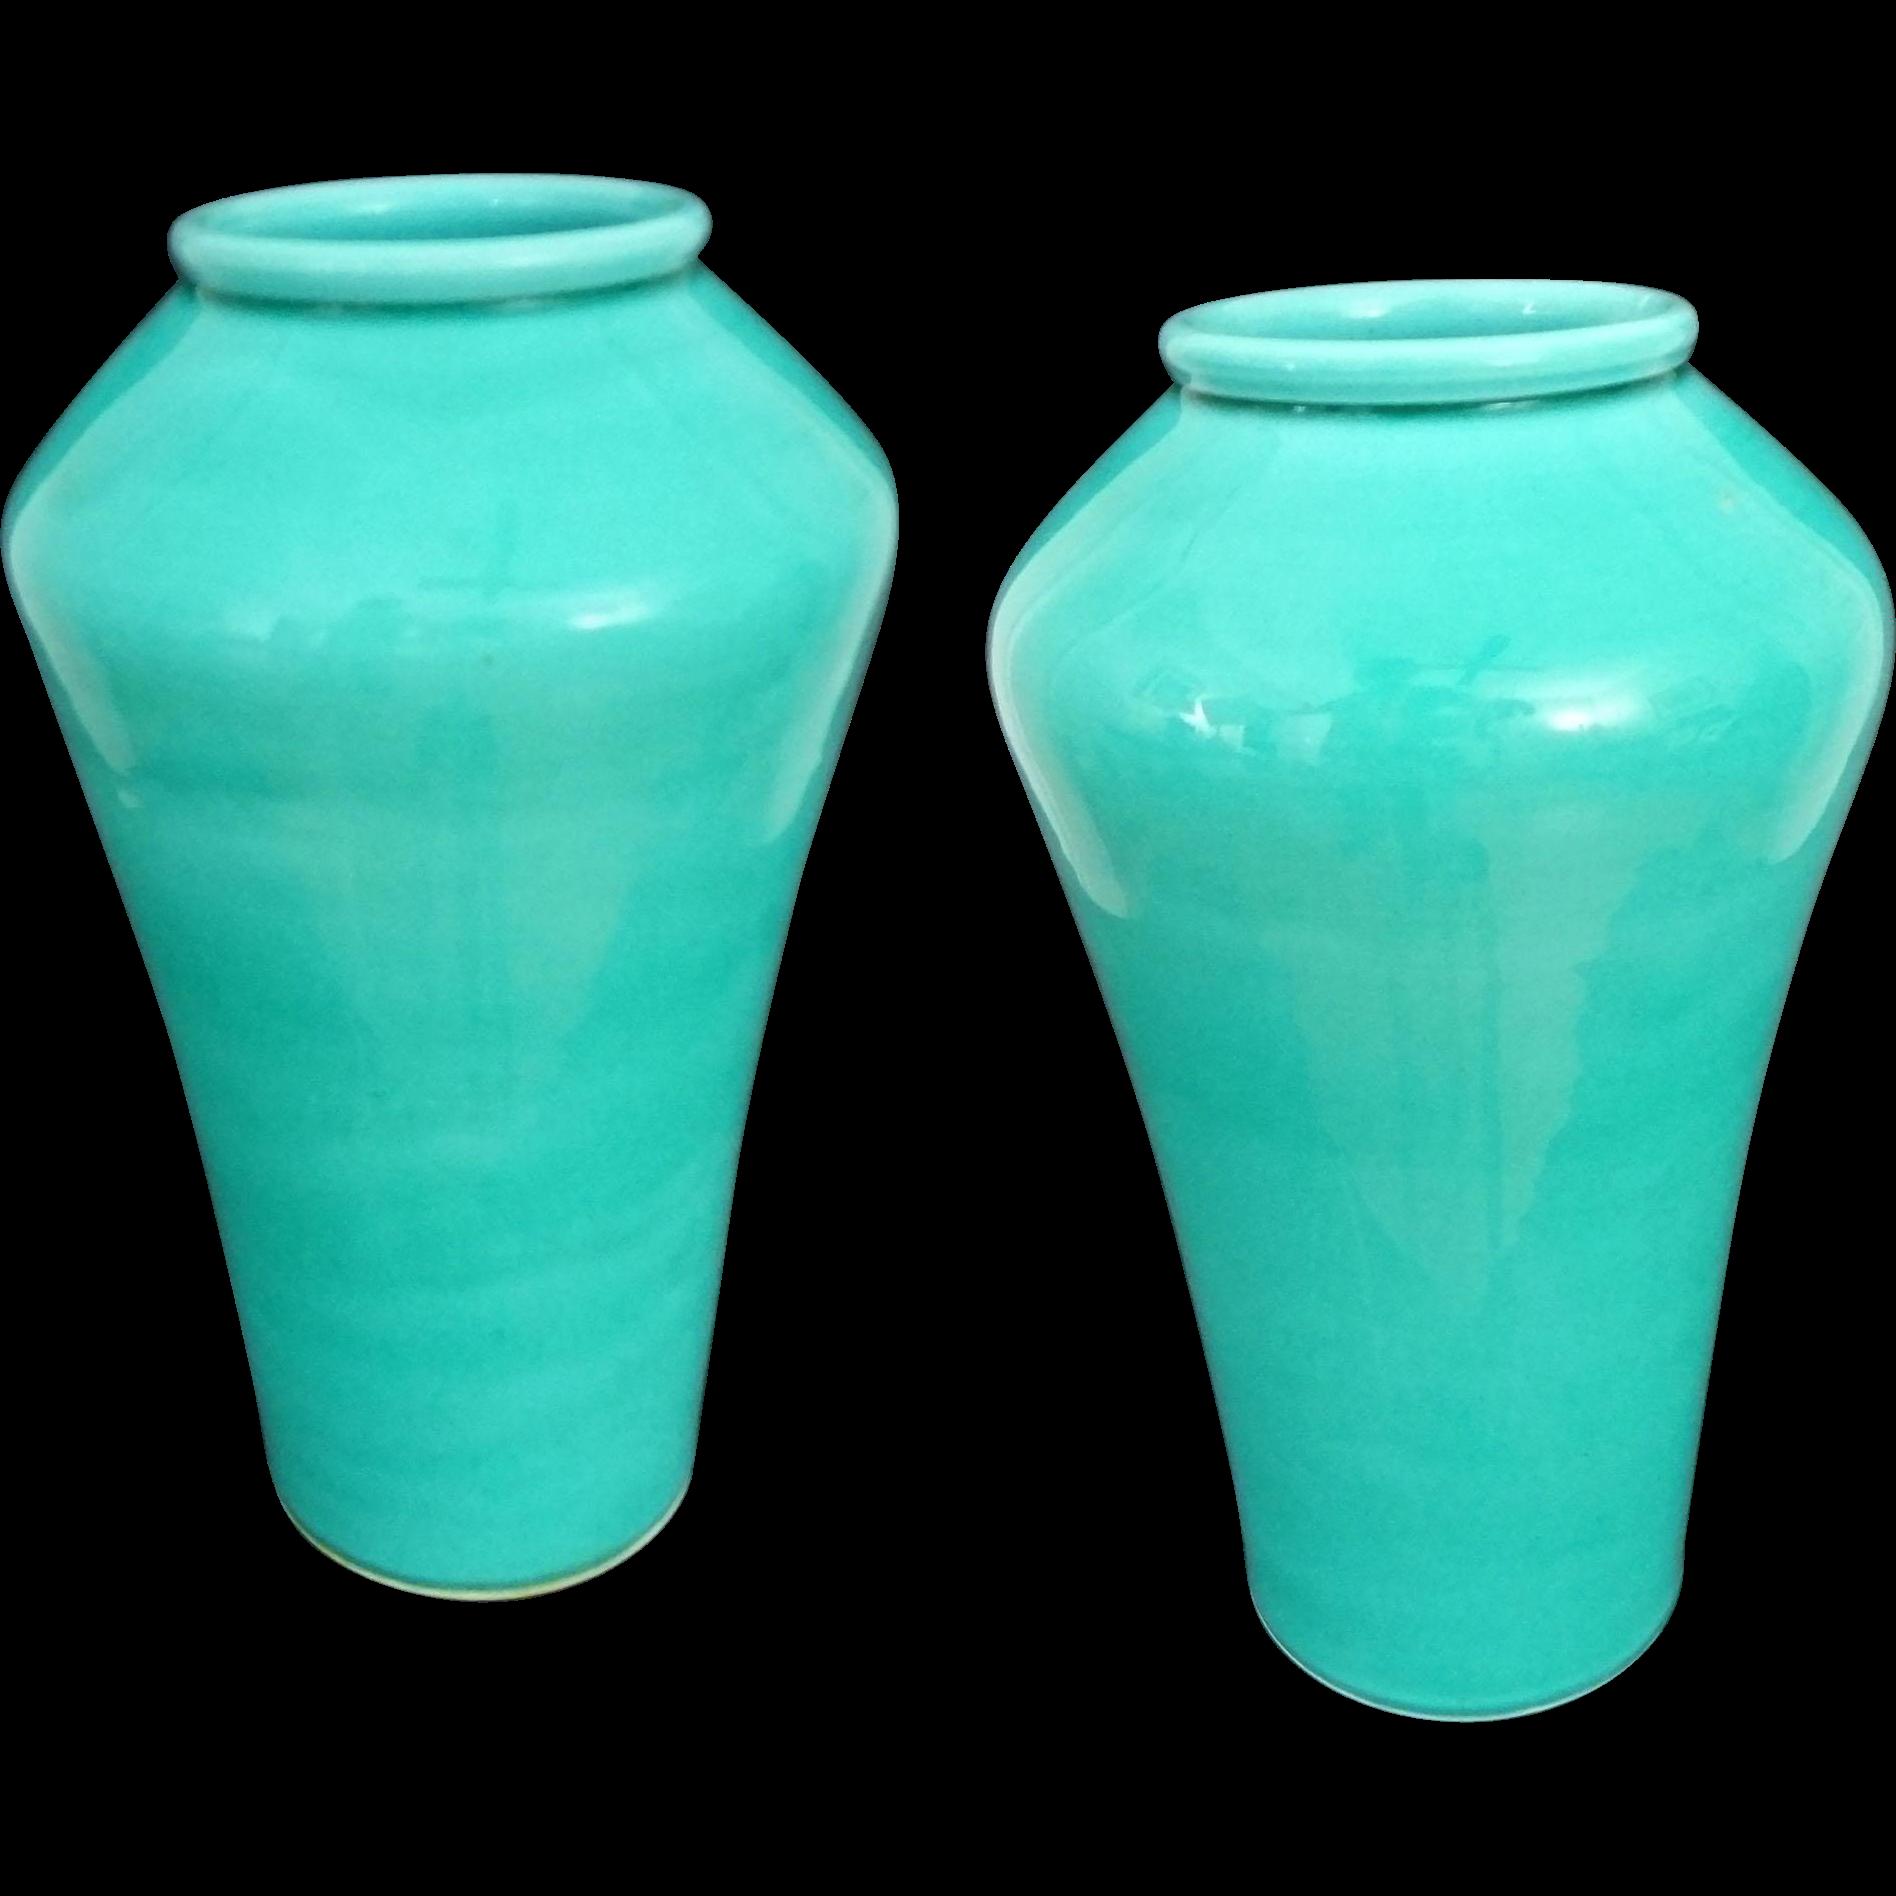 Pair Japanese Monochrome Light Turquoise Aqua Blue Green Glaze Pottery Vases - Pre 1922, Japan